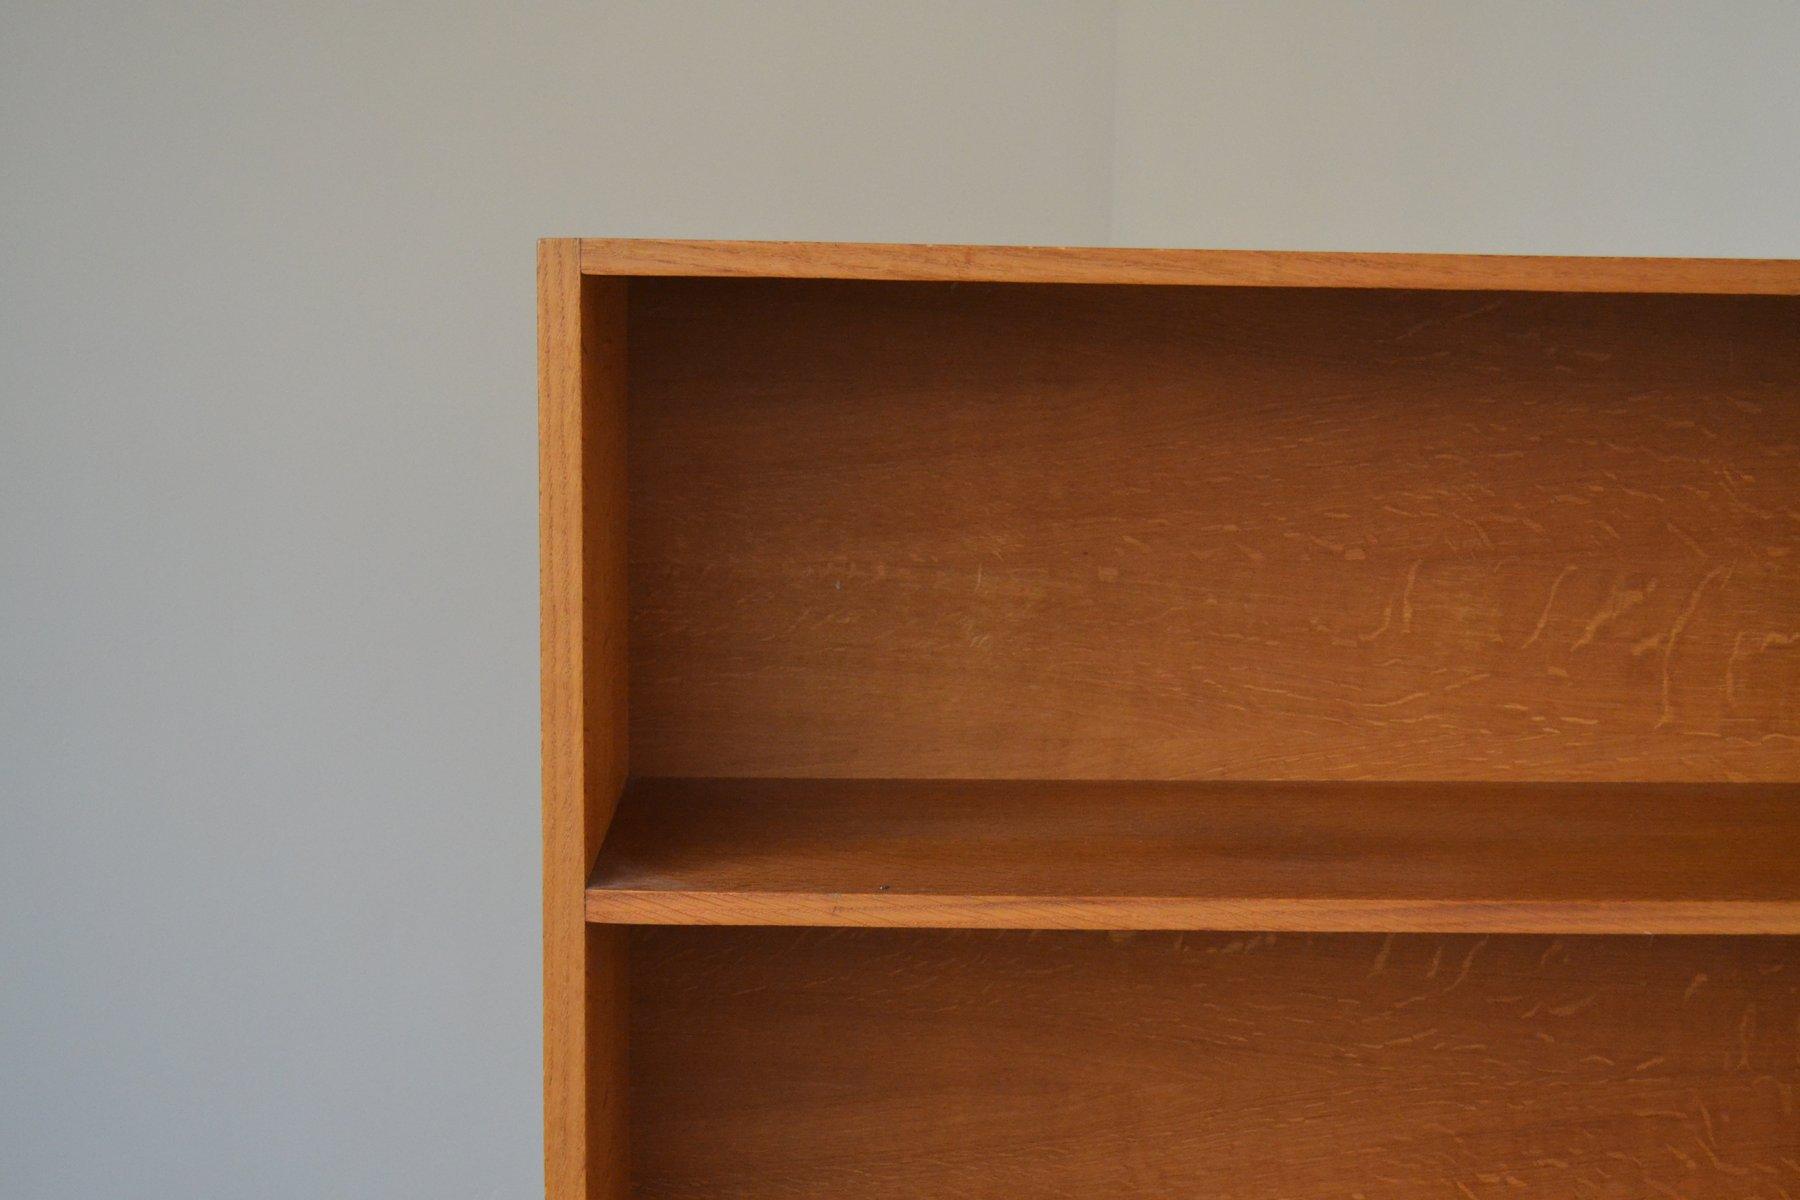 d nisches vintage regal 1970er bei pamono kaufen. Black Bedroom Furniture Sets. Home Design Ideas